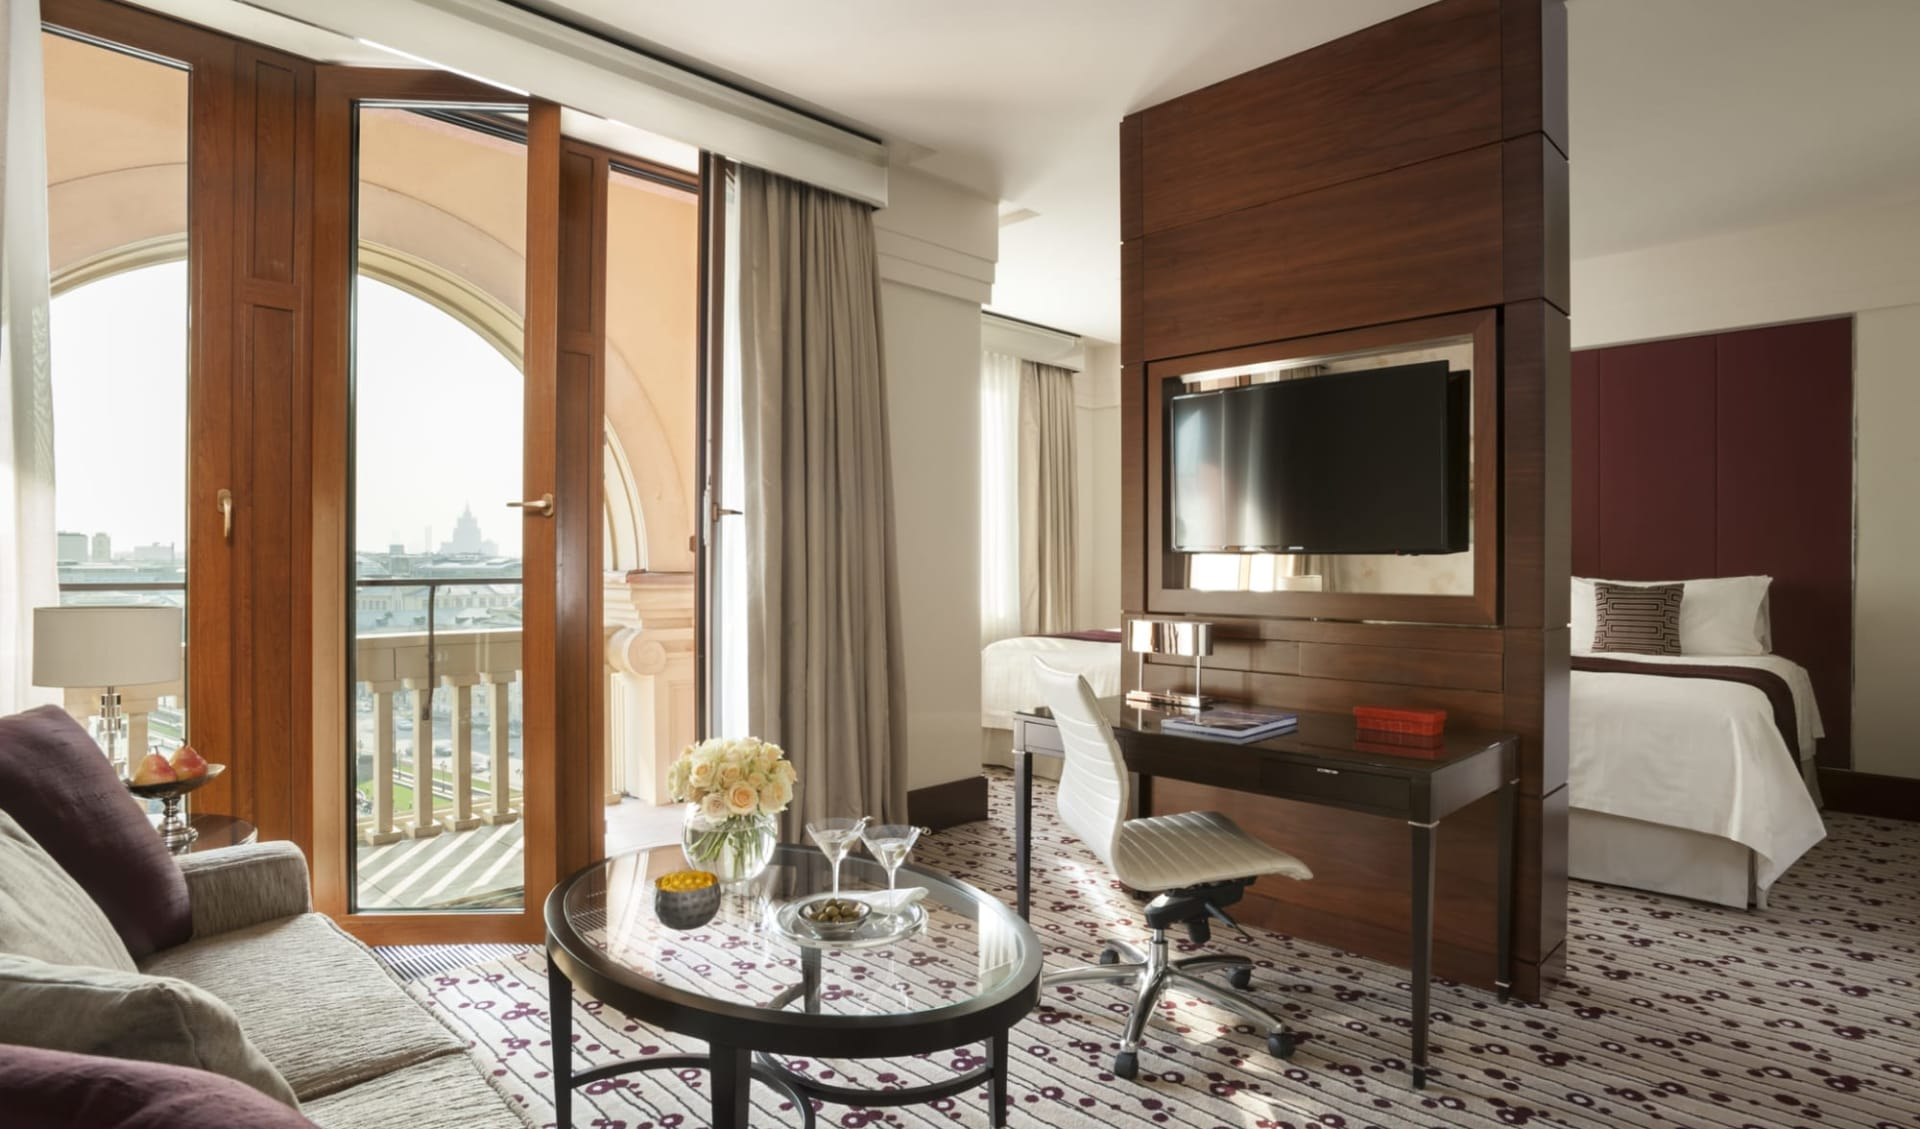 Hotel Four Seasons Moskau: Russland_Moskau_Four Seasons_Grand Premier room